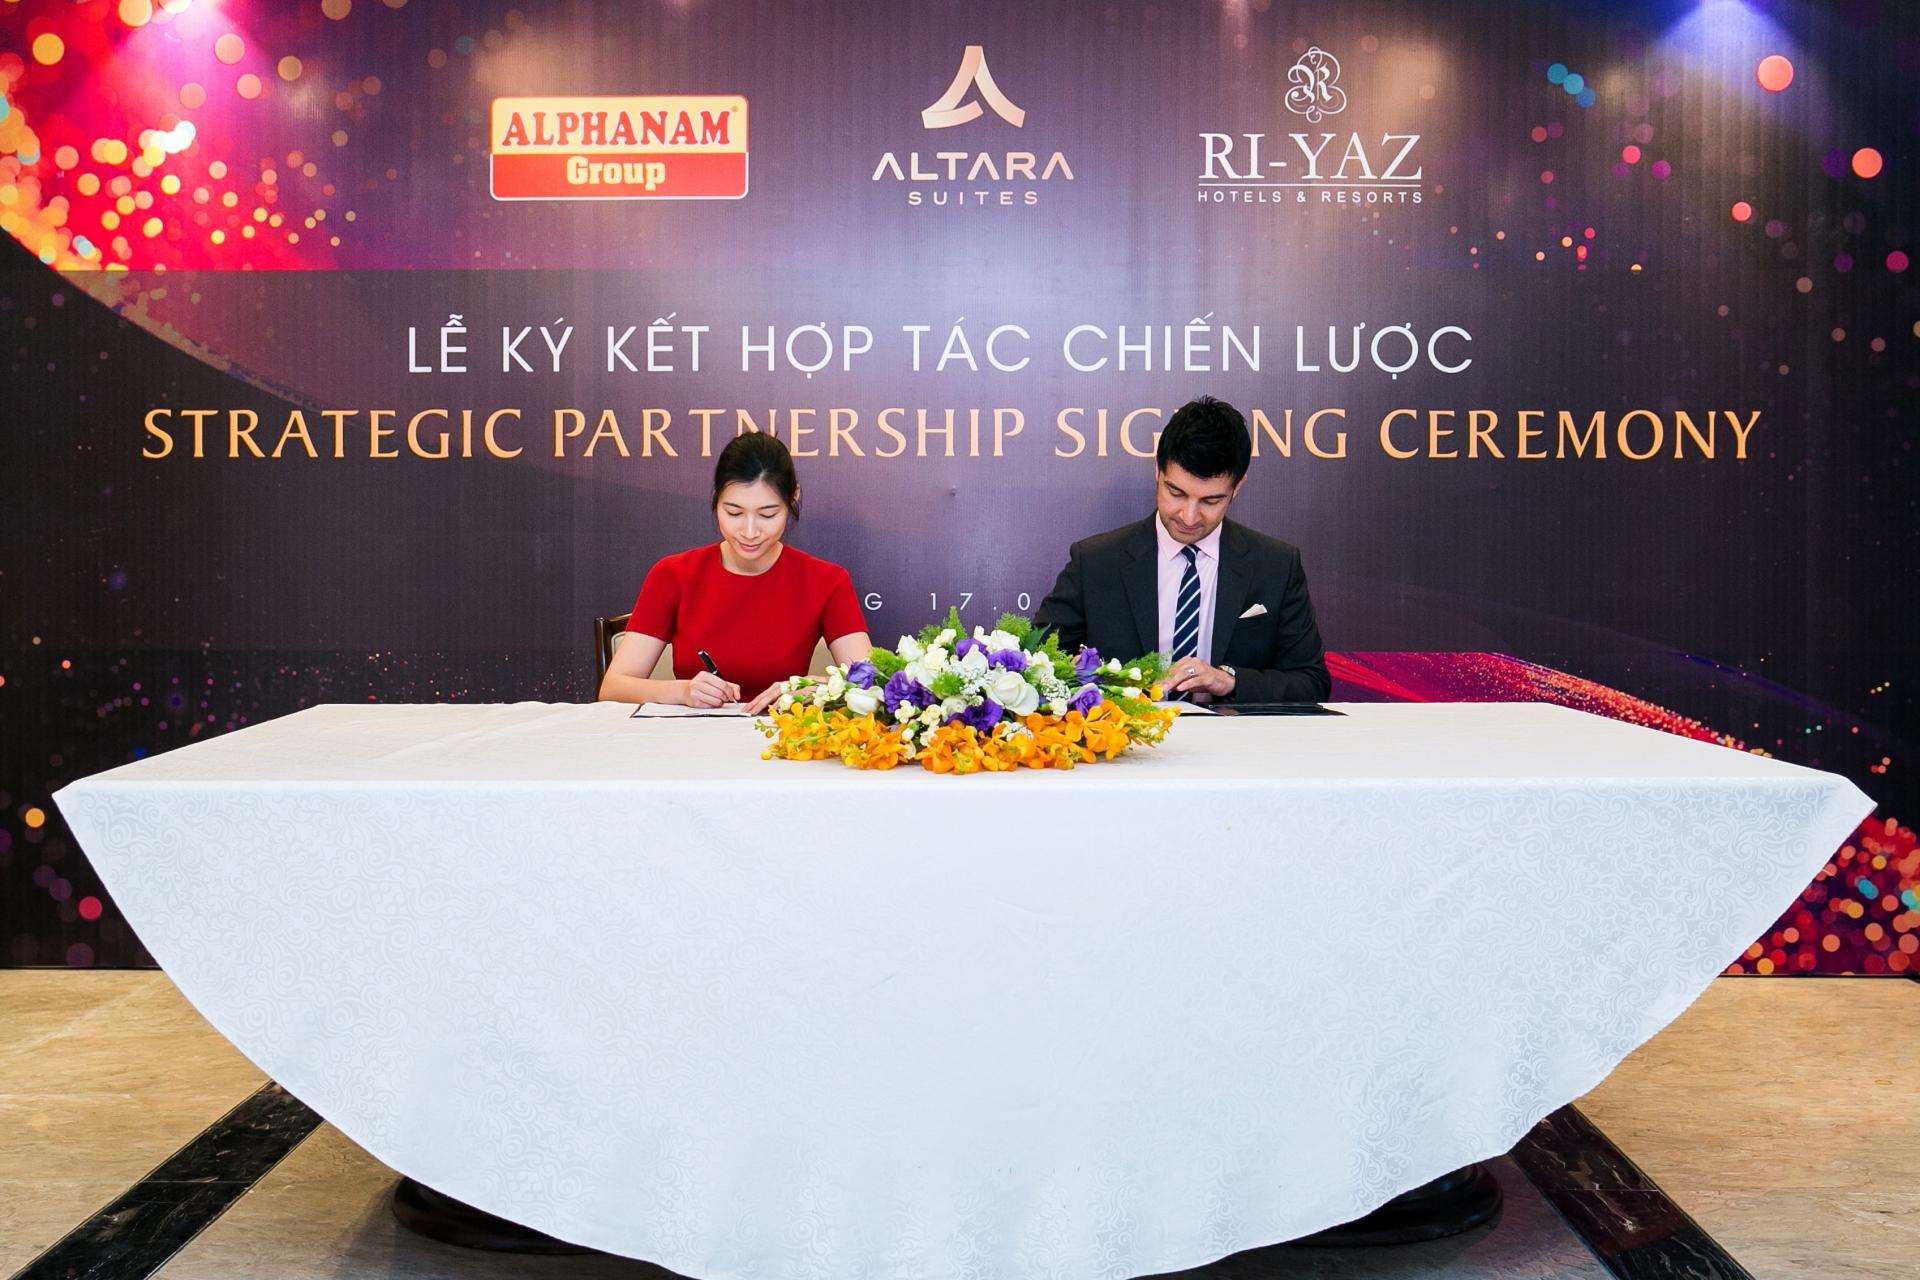 altara suites aims to reach danang top 10